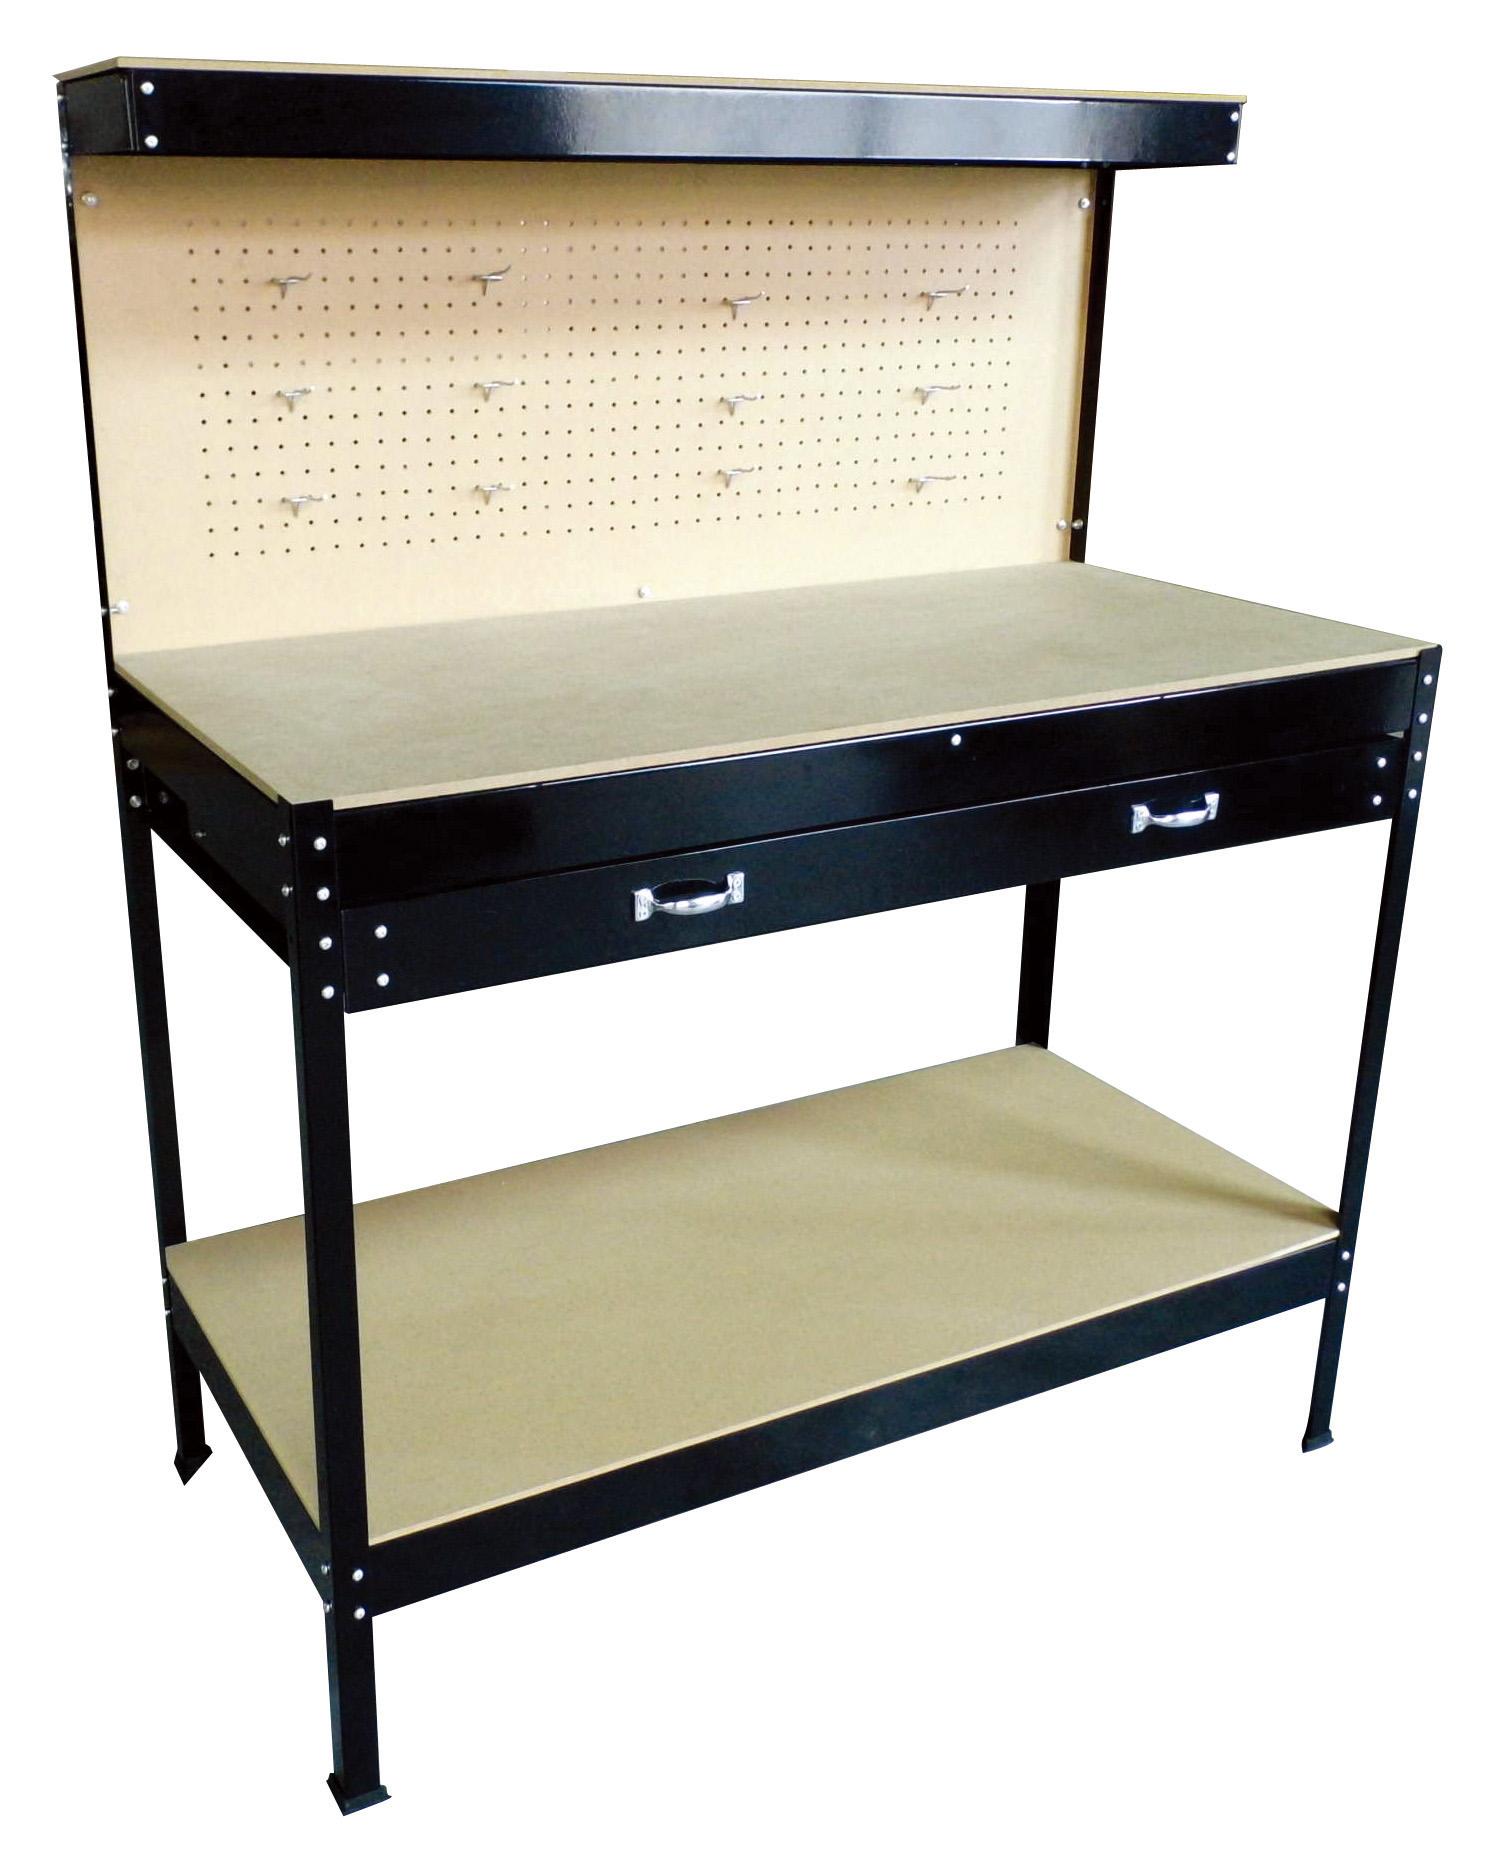 New Black Steel Tools Box Workbench Garage Workshop Table